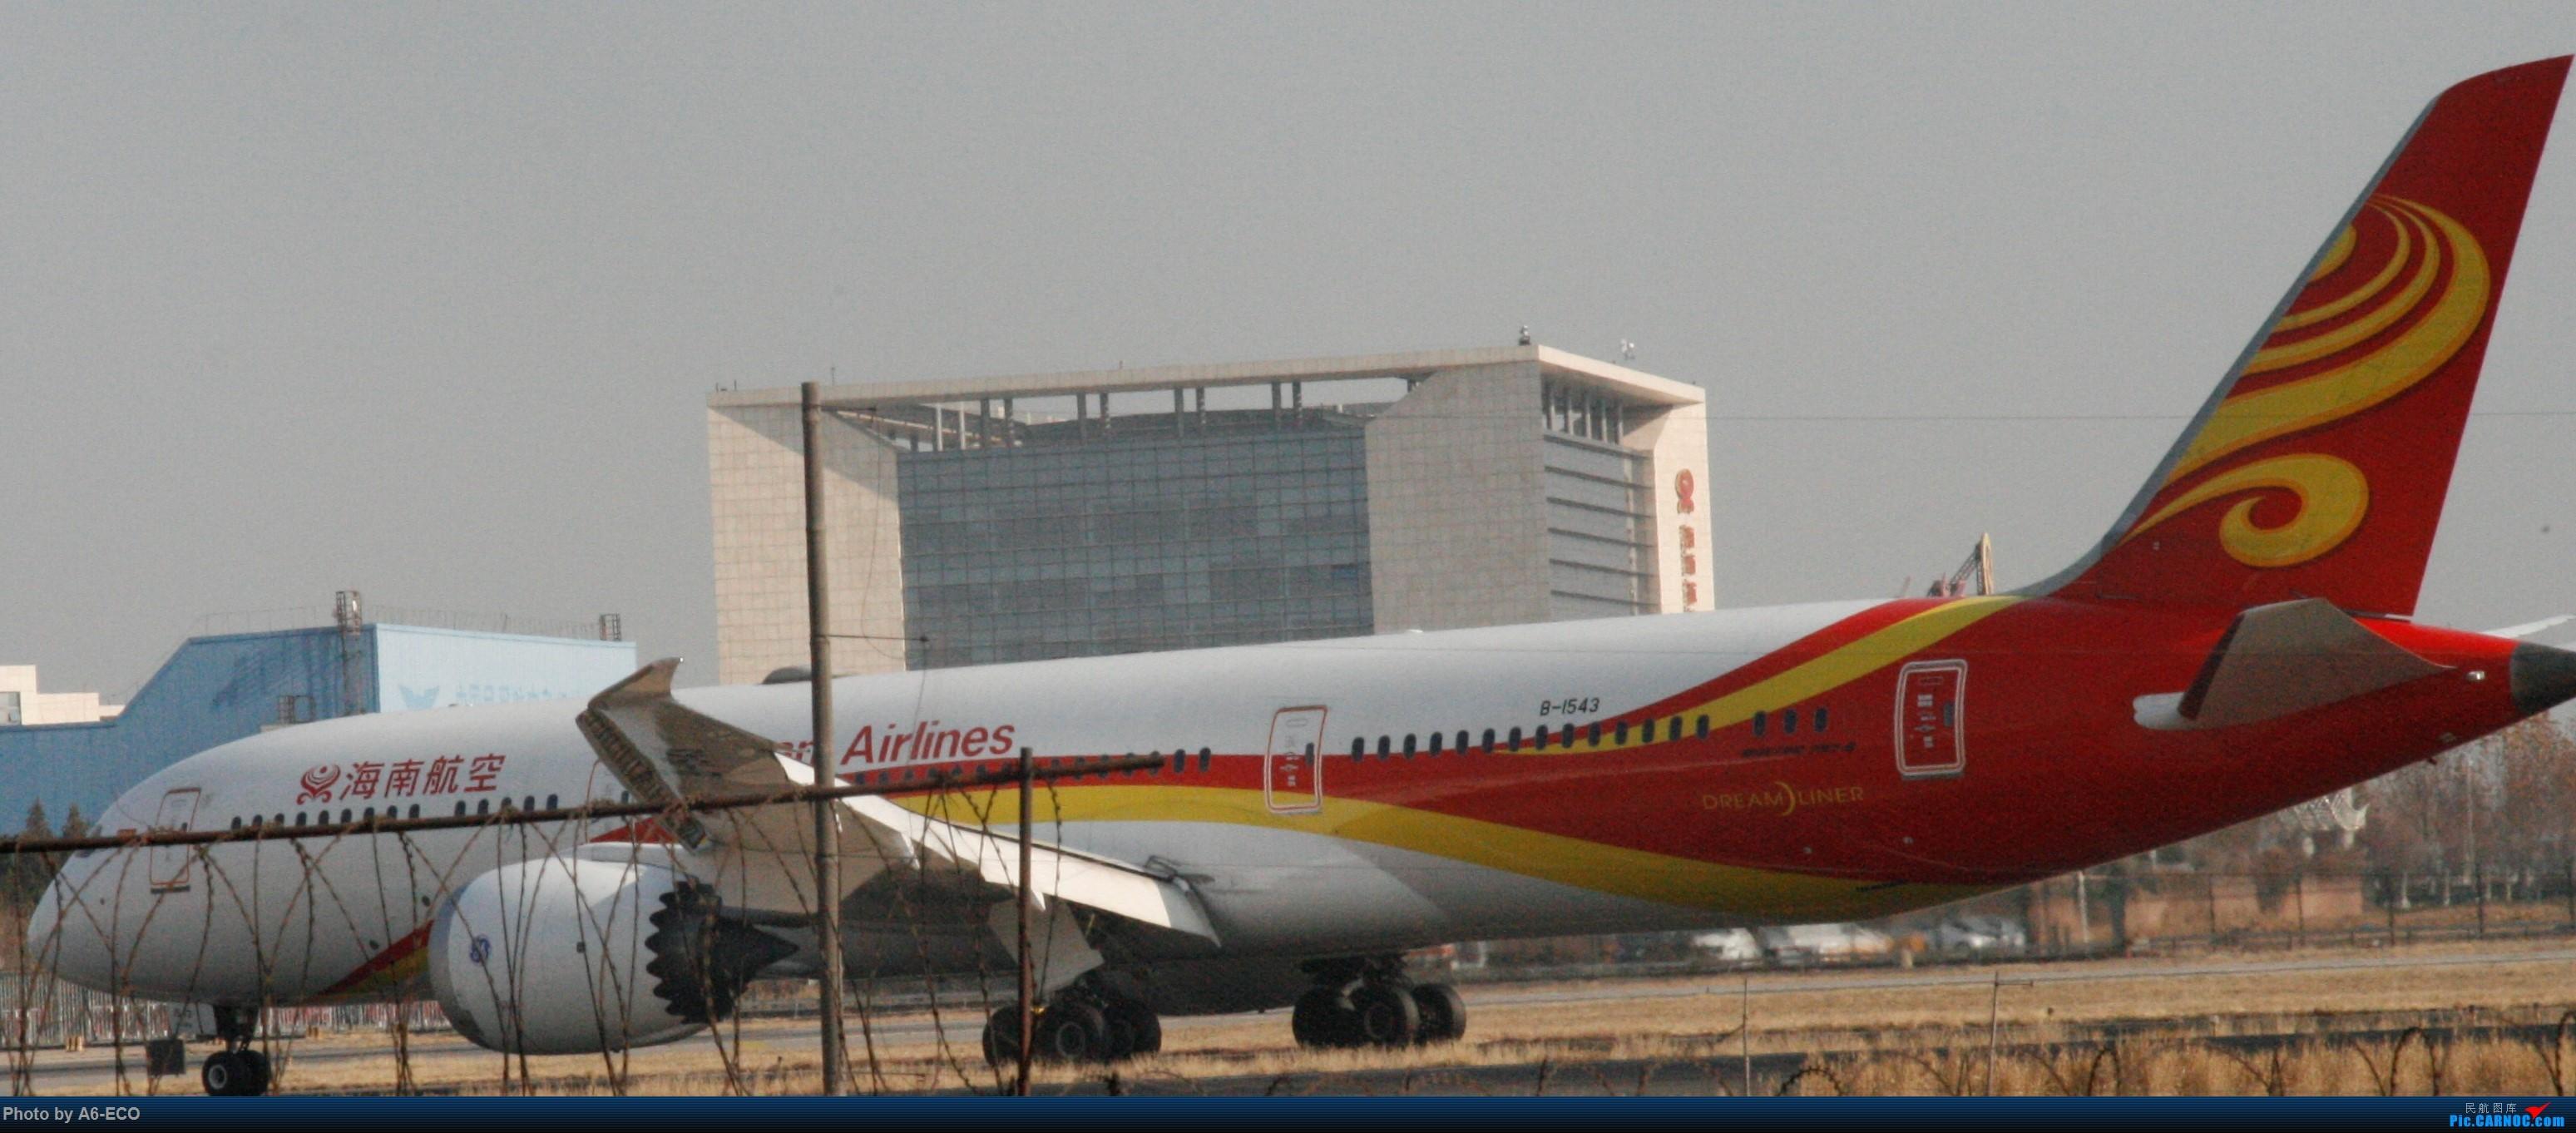 Re:[原创]今天运气极好,云南孔雀,B-1070,2个菜航邮戳,泡菜航彩绘,东航邮戳...... BOEING 787-9 B-1543 中国北京首都国际机场